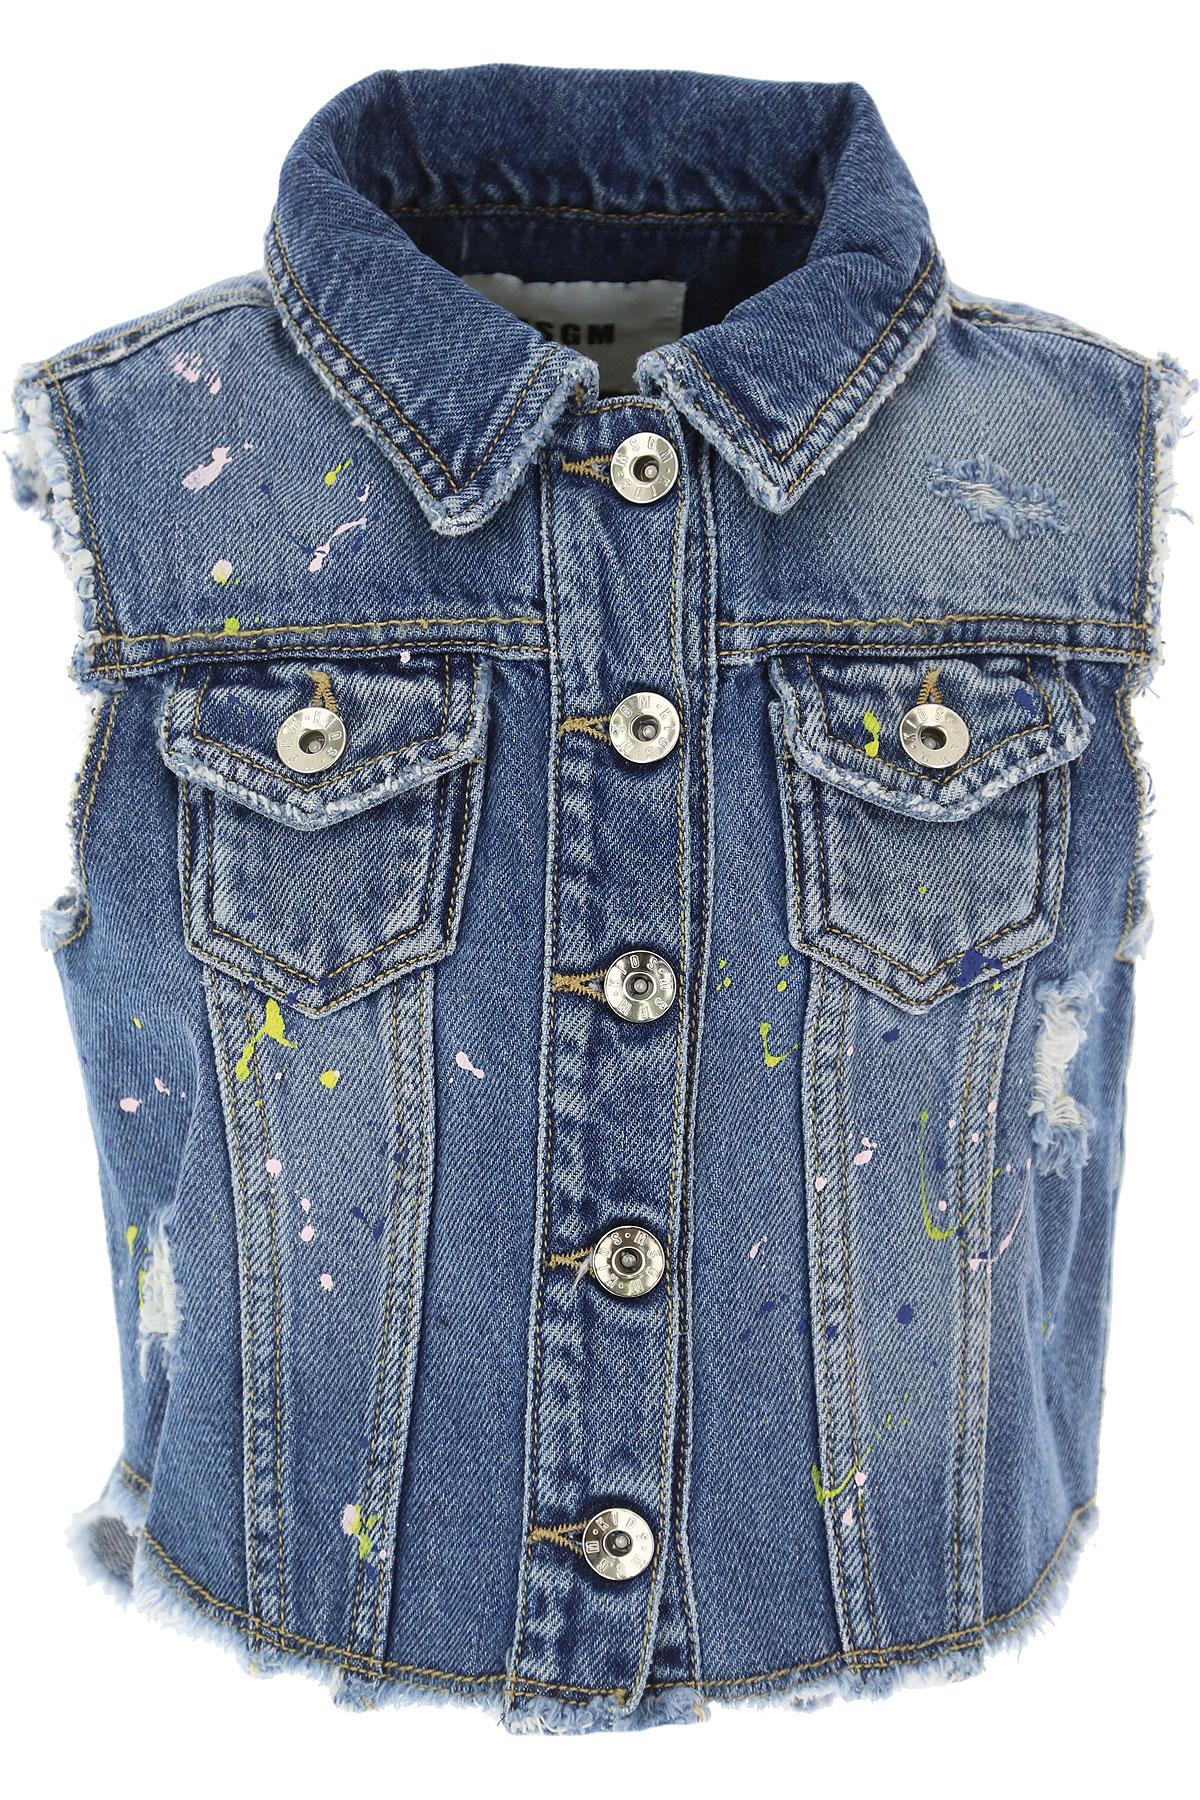 MSGM Kids Jacket for Girls, Blue Denim, Cotton, 2017, 10Y 14Y